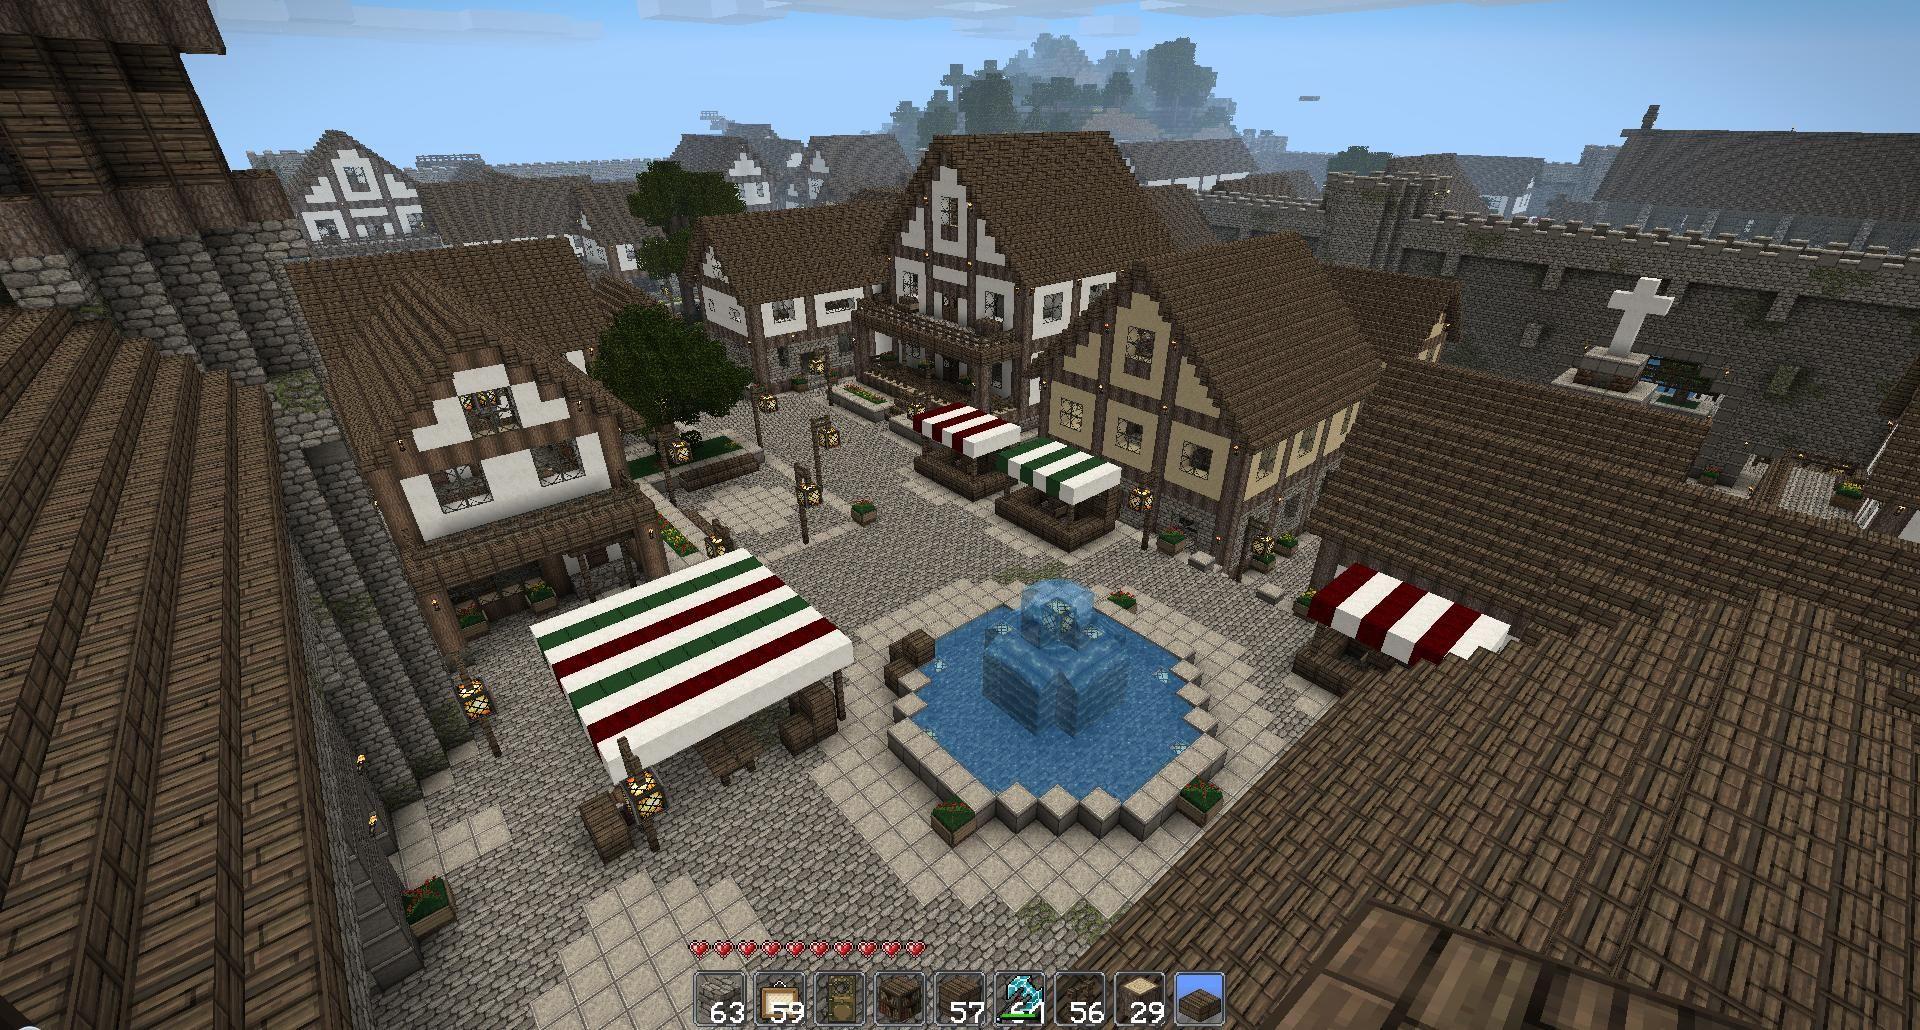 Oddworld U0026 39 S Medieval Map  Wip  V4 - Screenshots - Show Your Creation